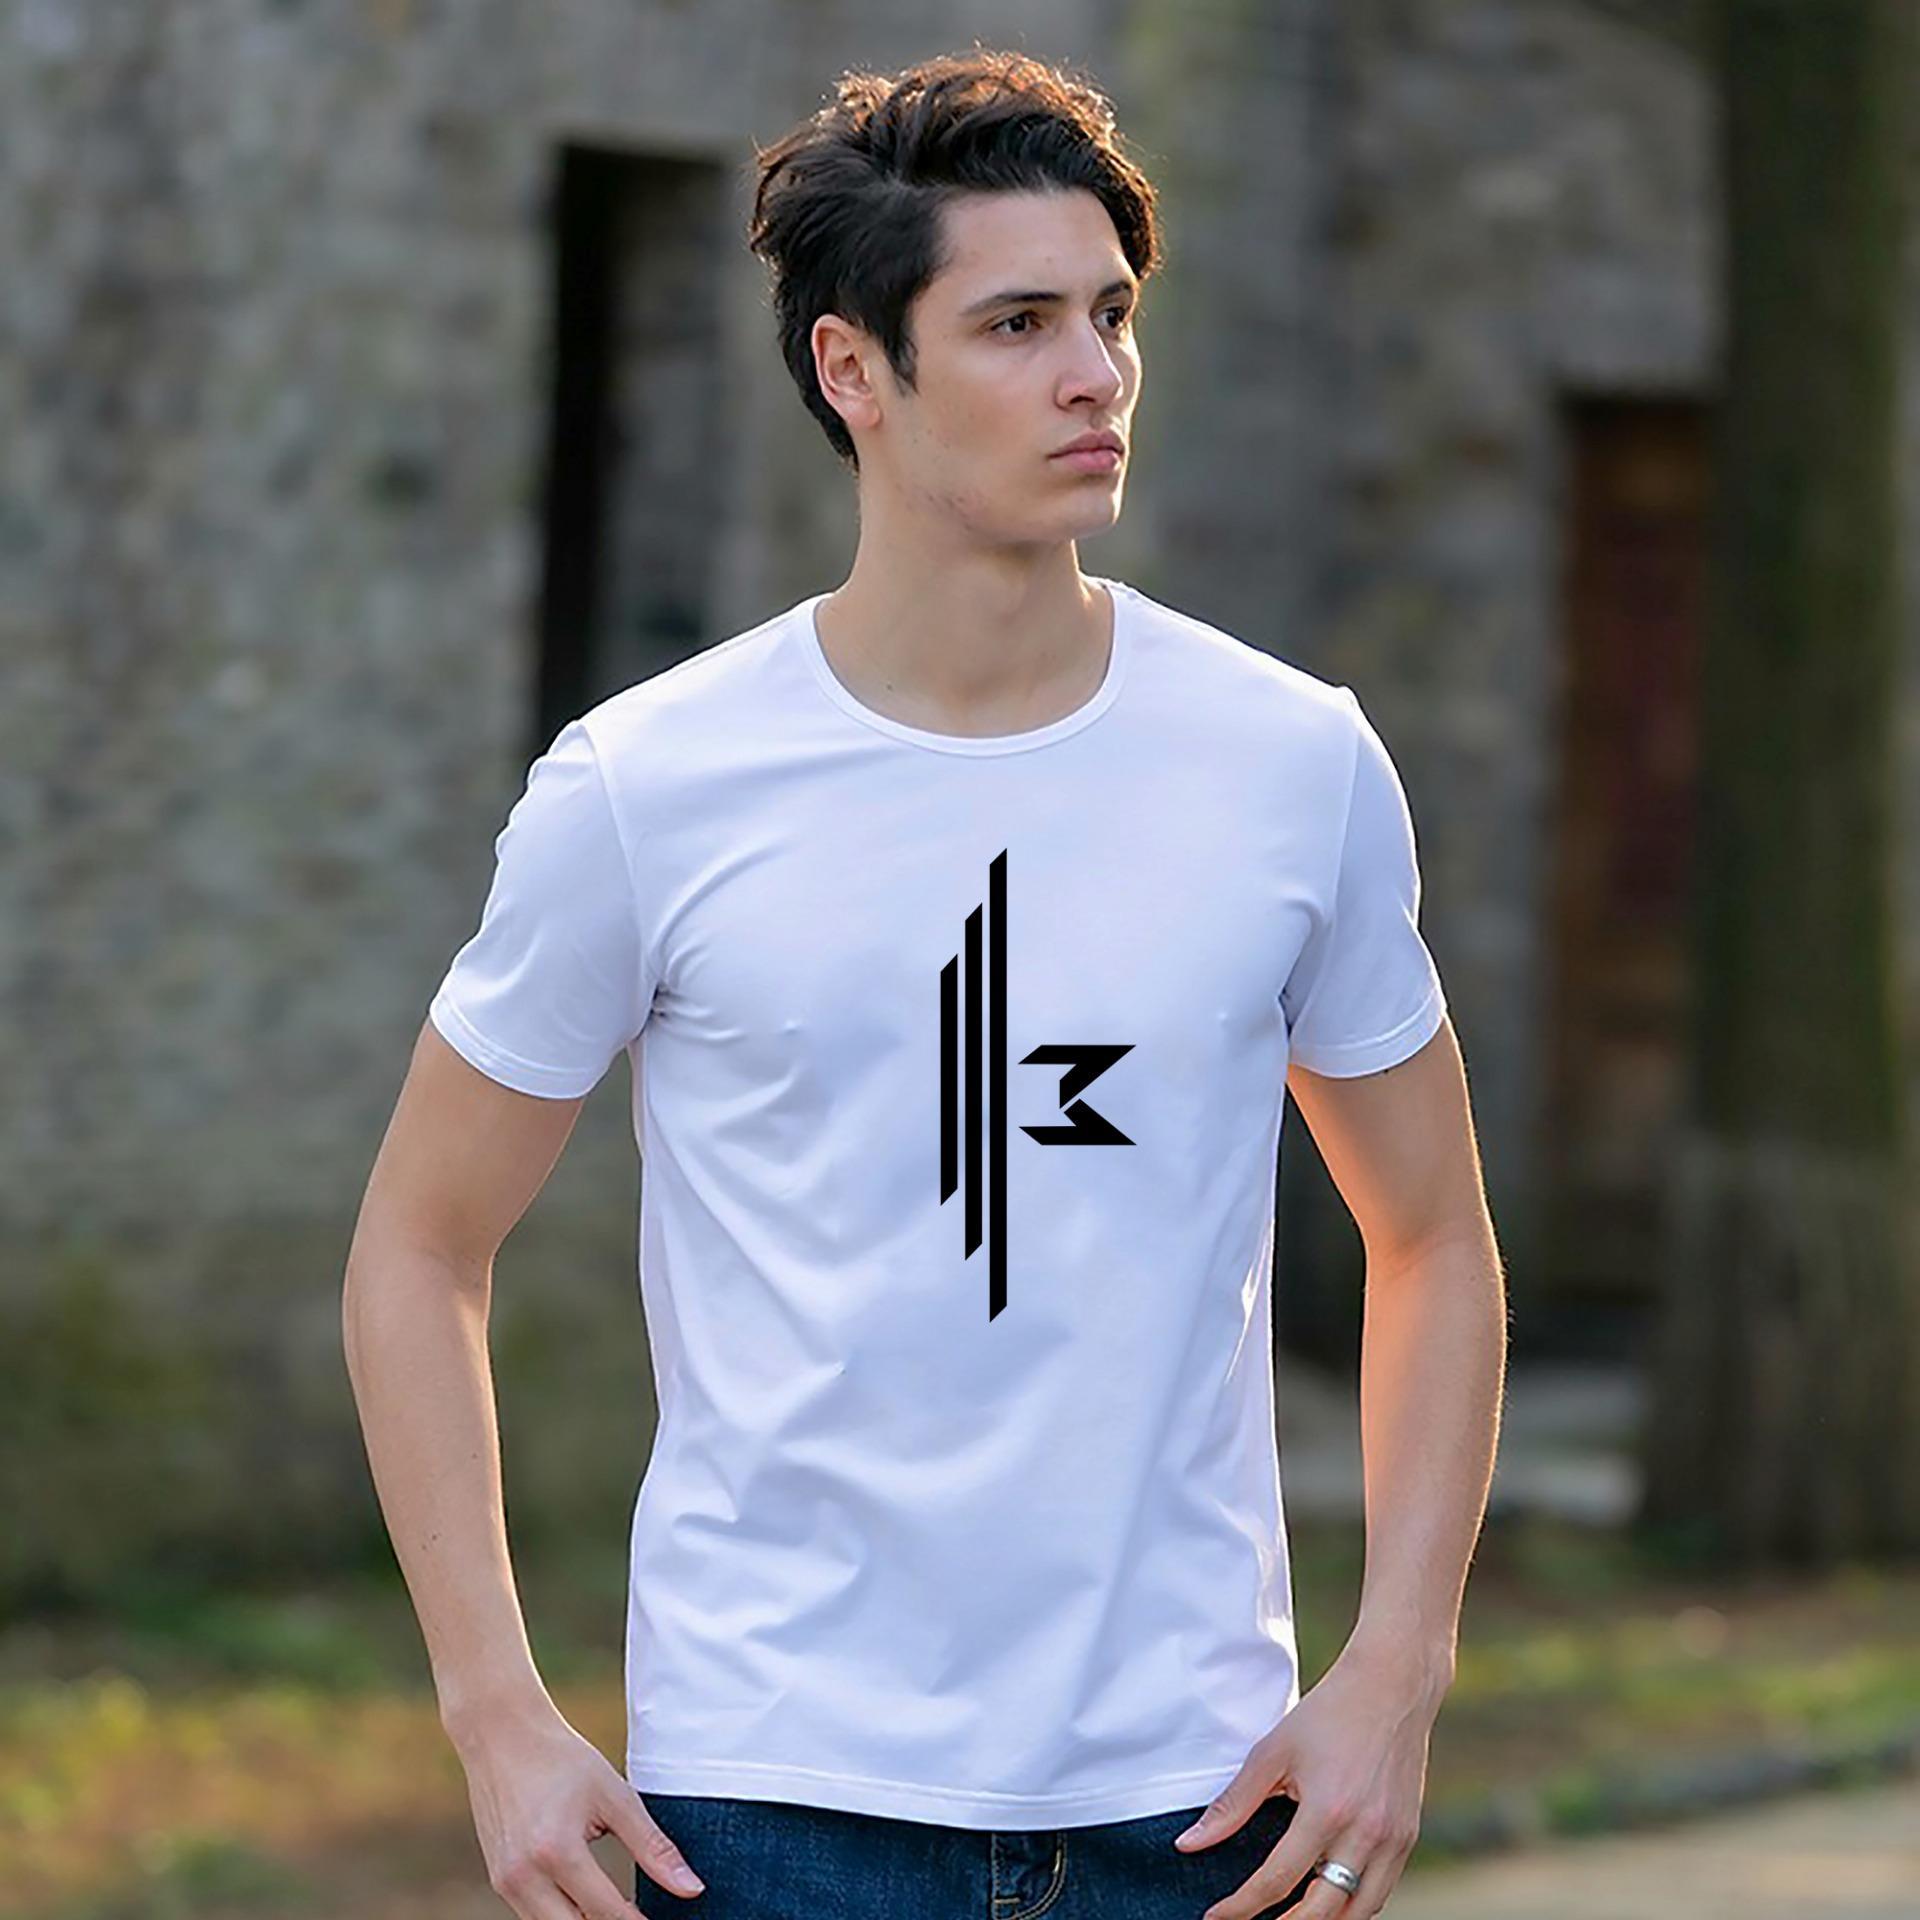 Jual Kaos Distro Walexa T Shirt Putih Murah